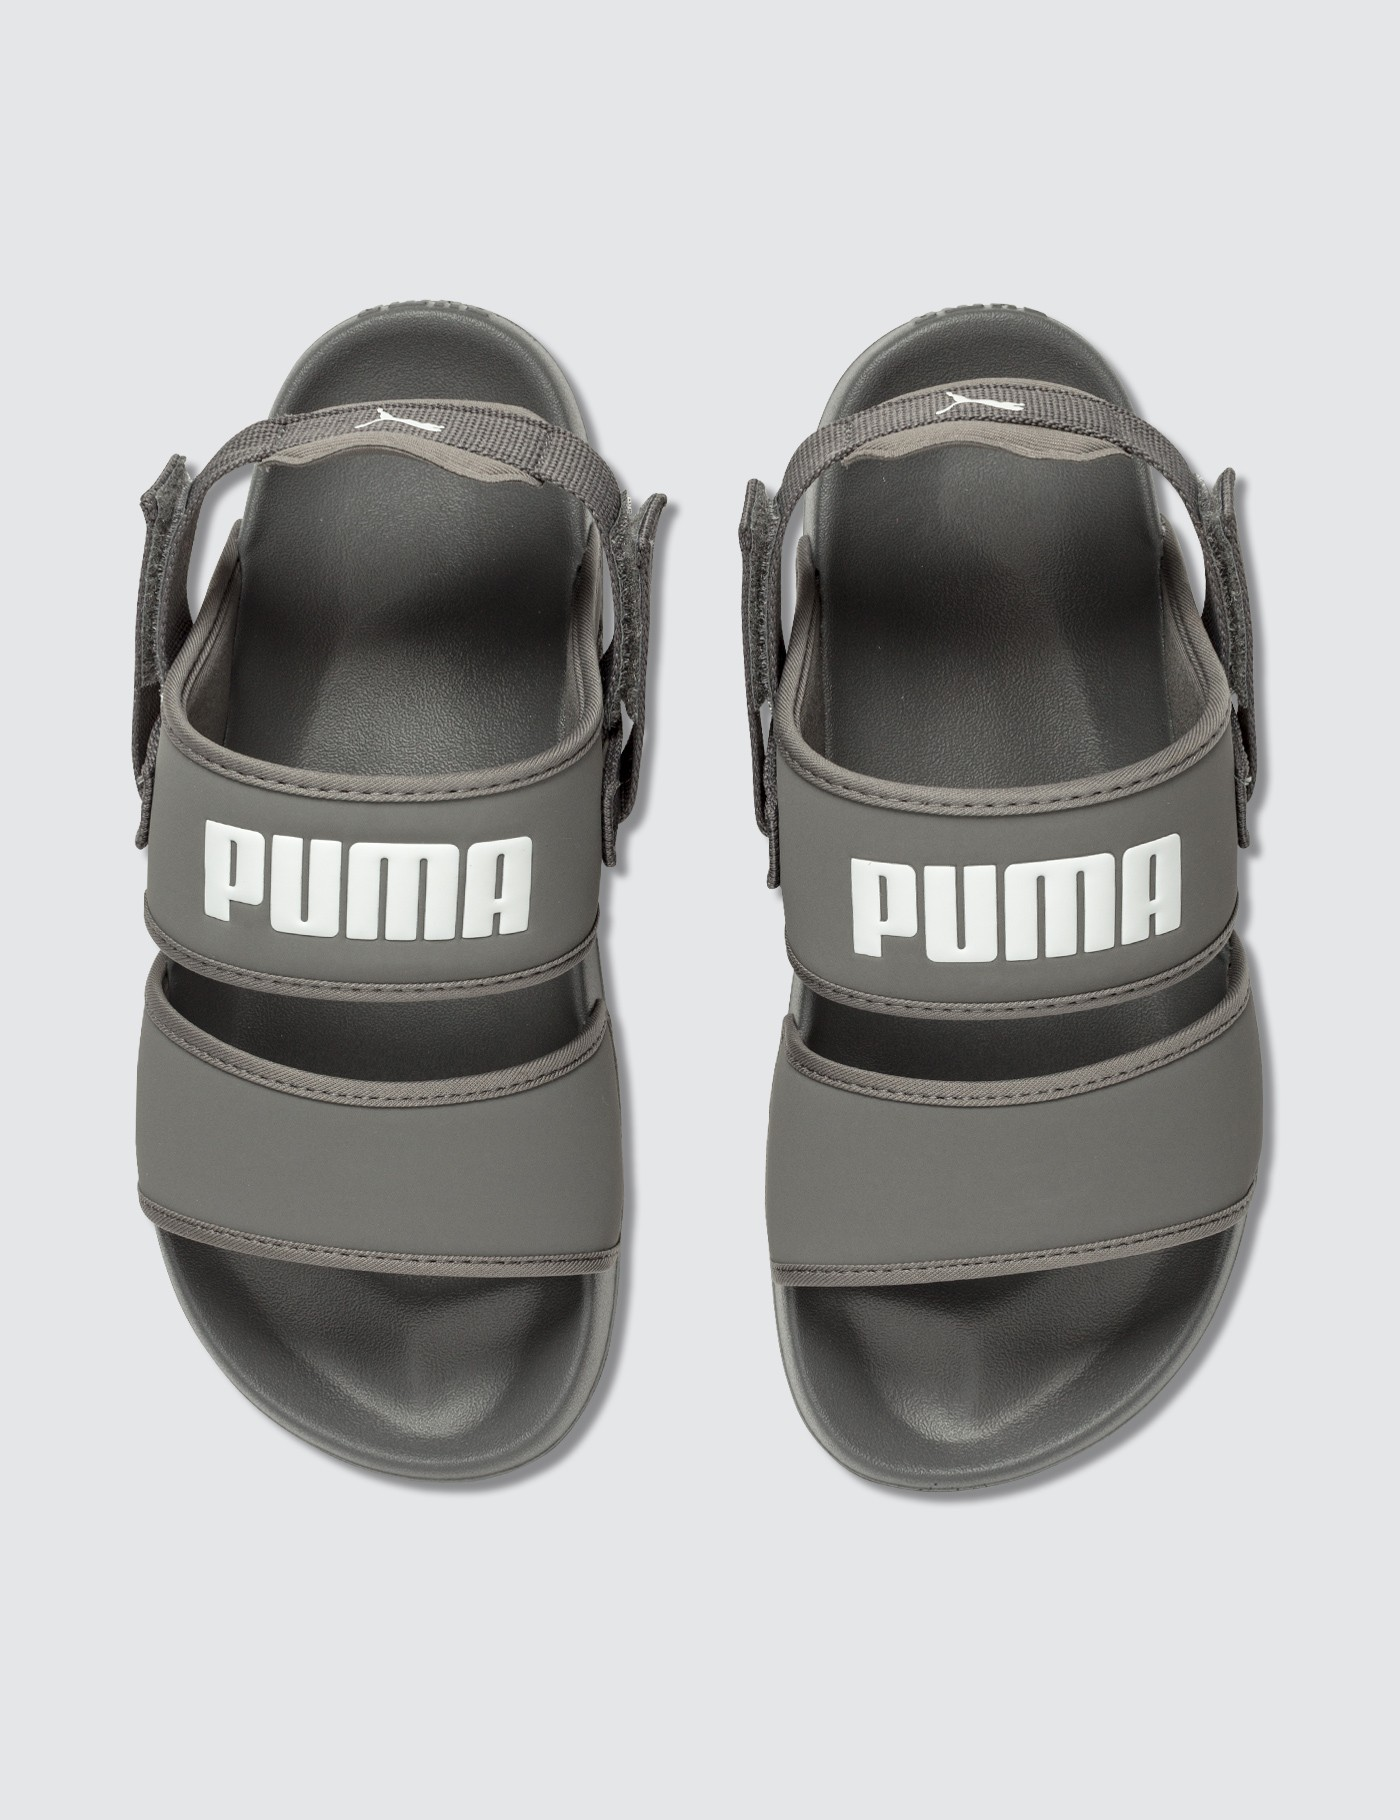 Puma - Leadcat Ylm Lite | HBX